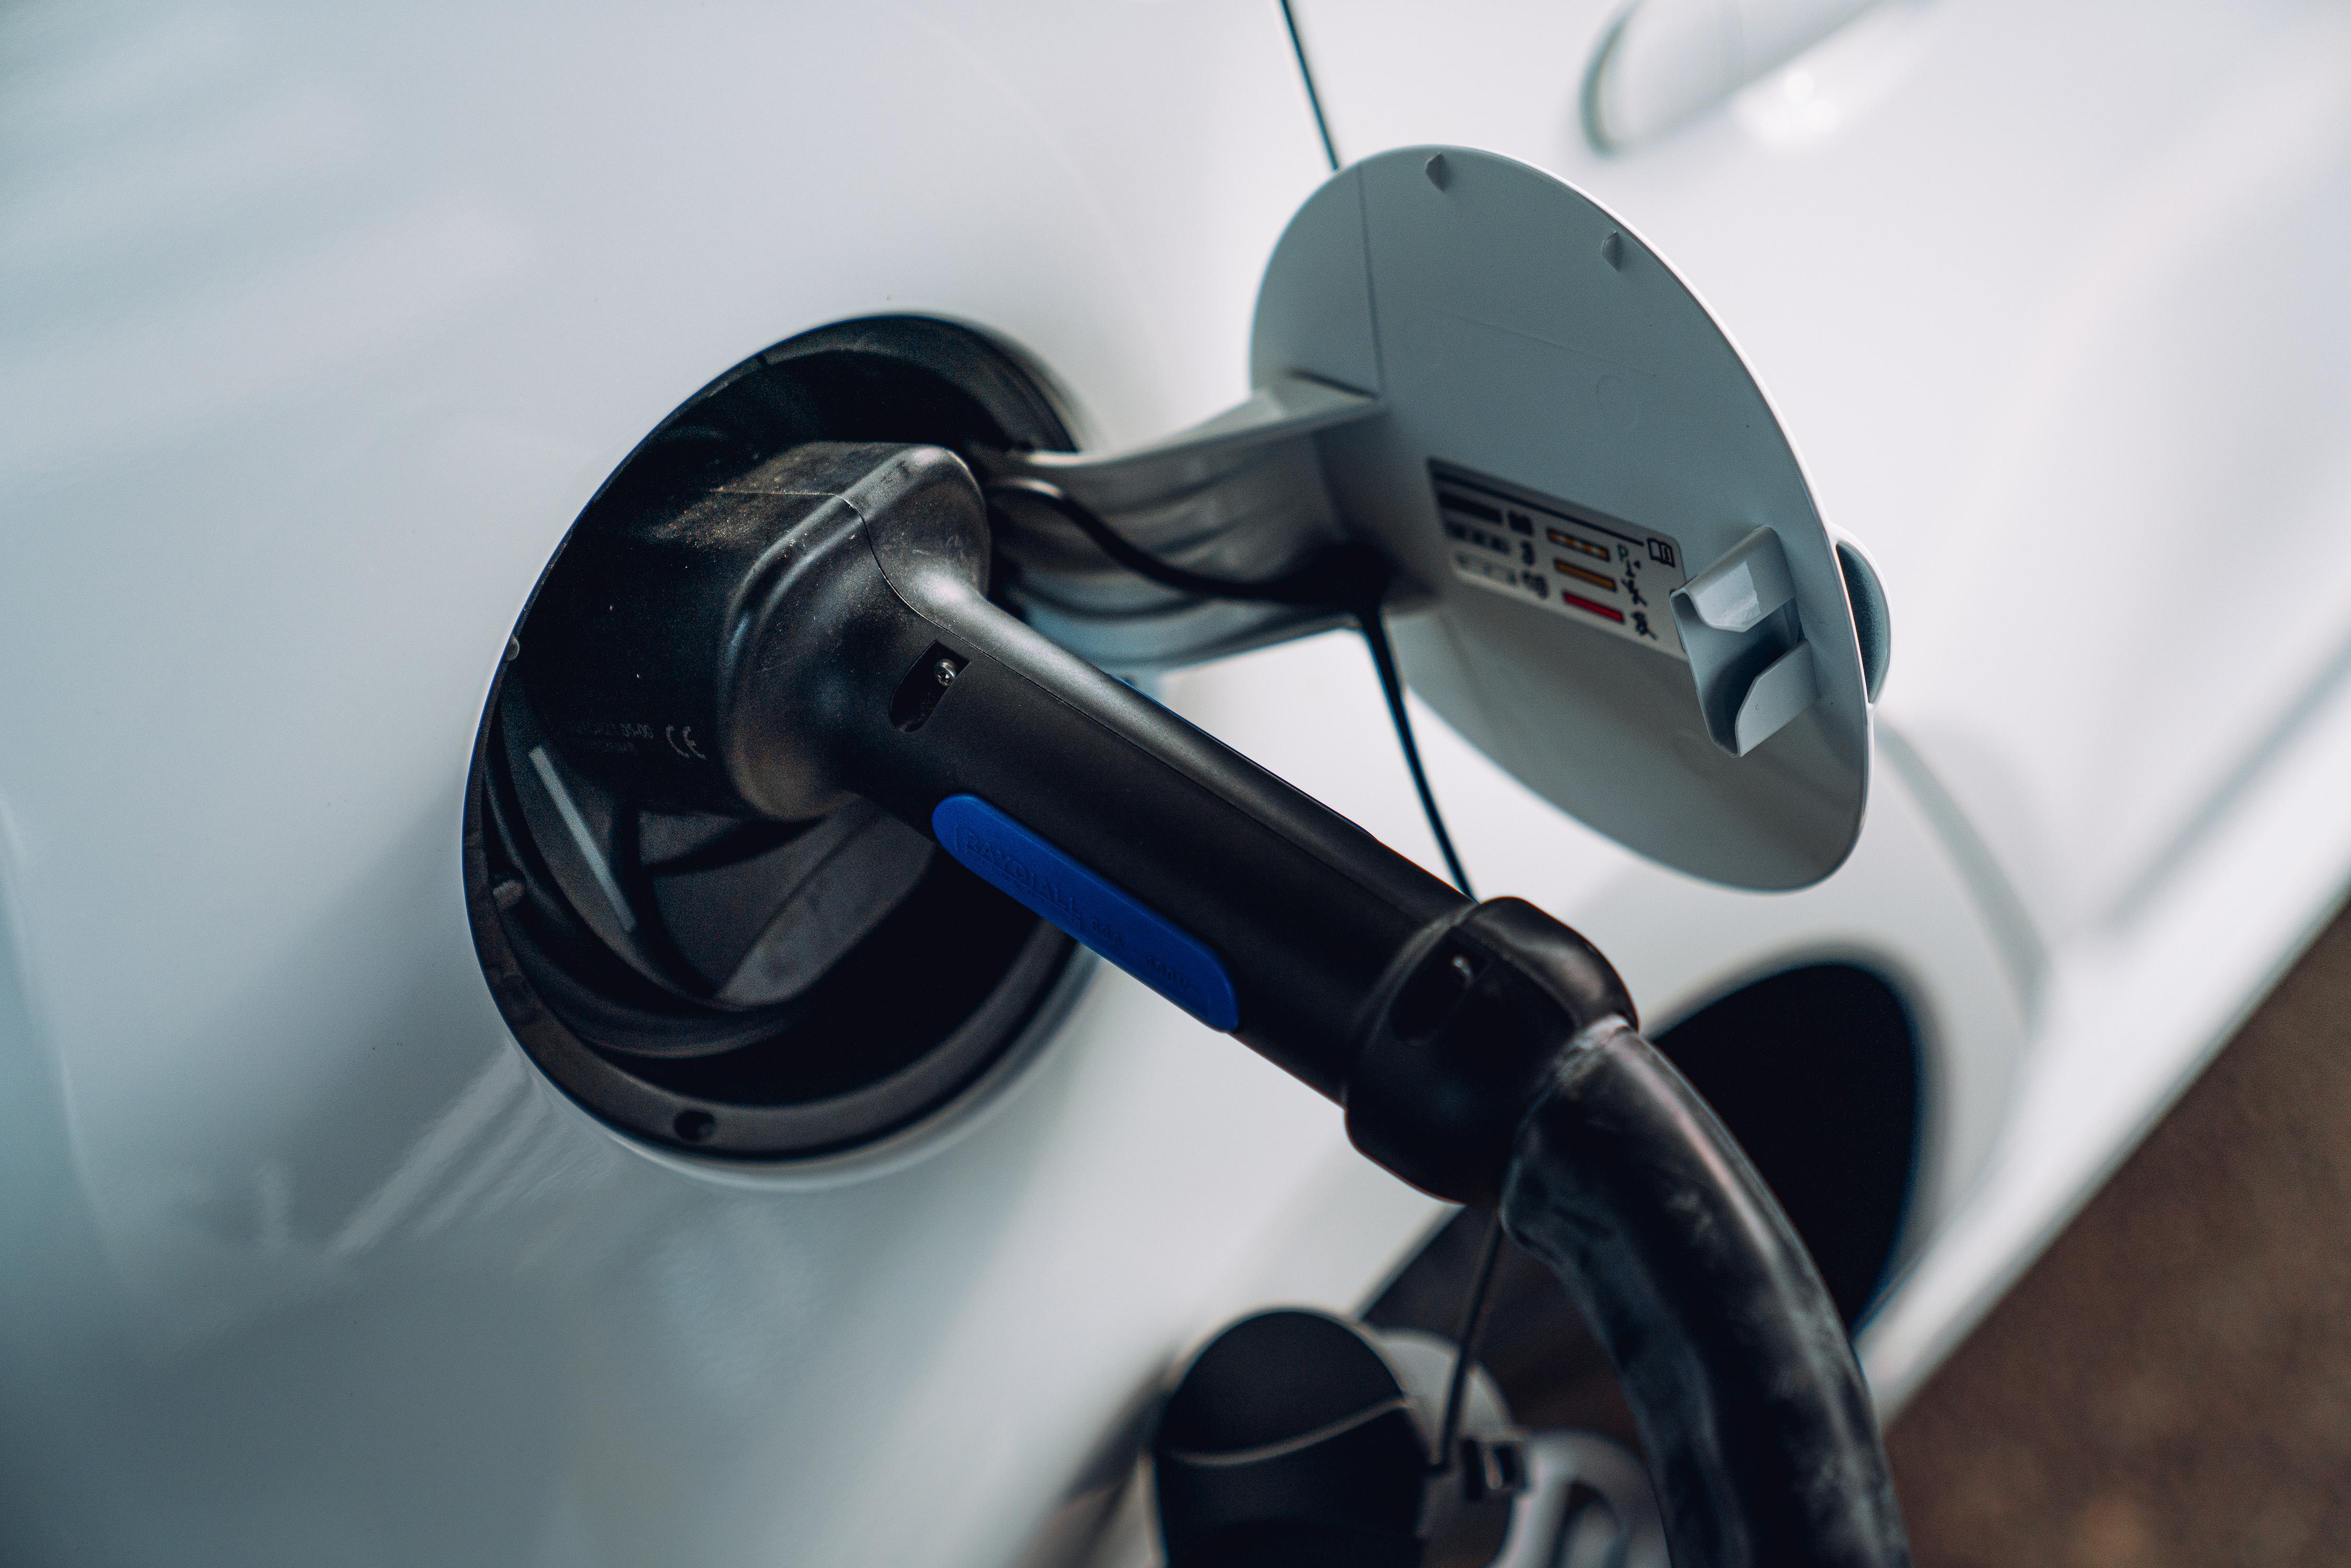 e-Up! charging port